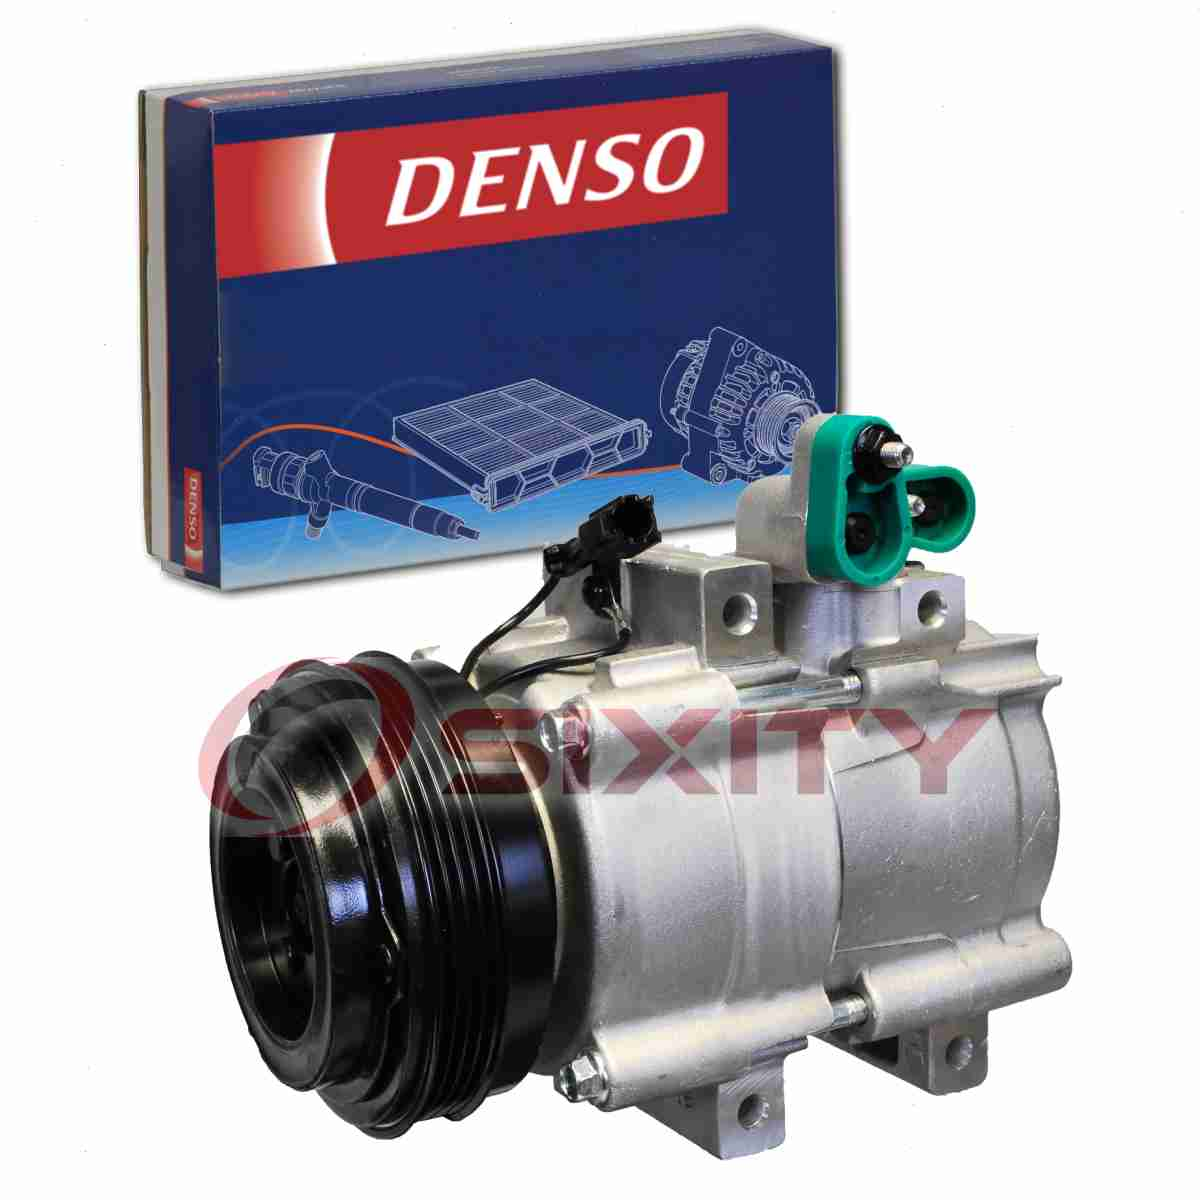 A//C Compressor Kit Fits Kia Sorento 2003-2006 V6 3.5L 57190